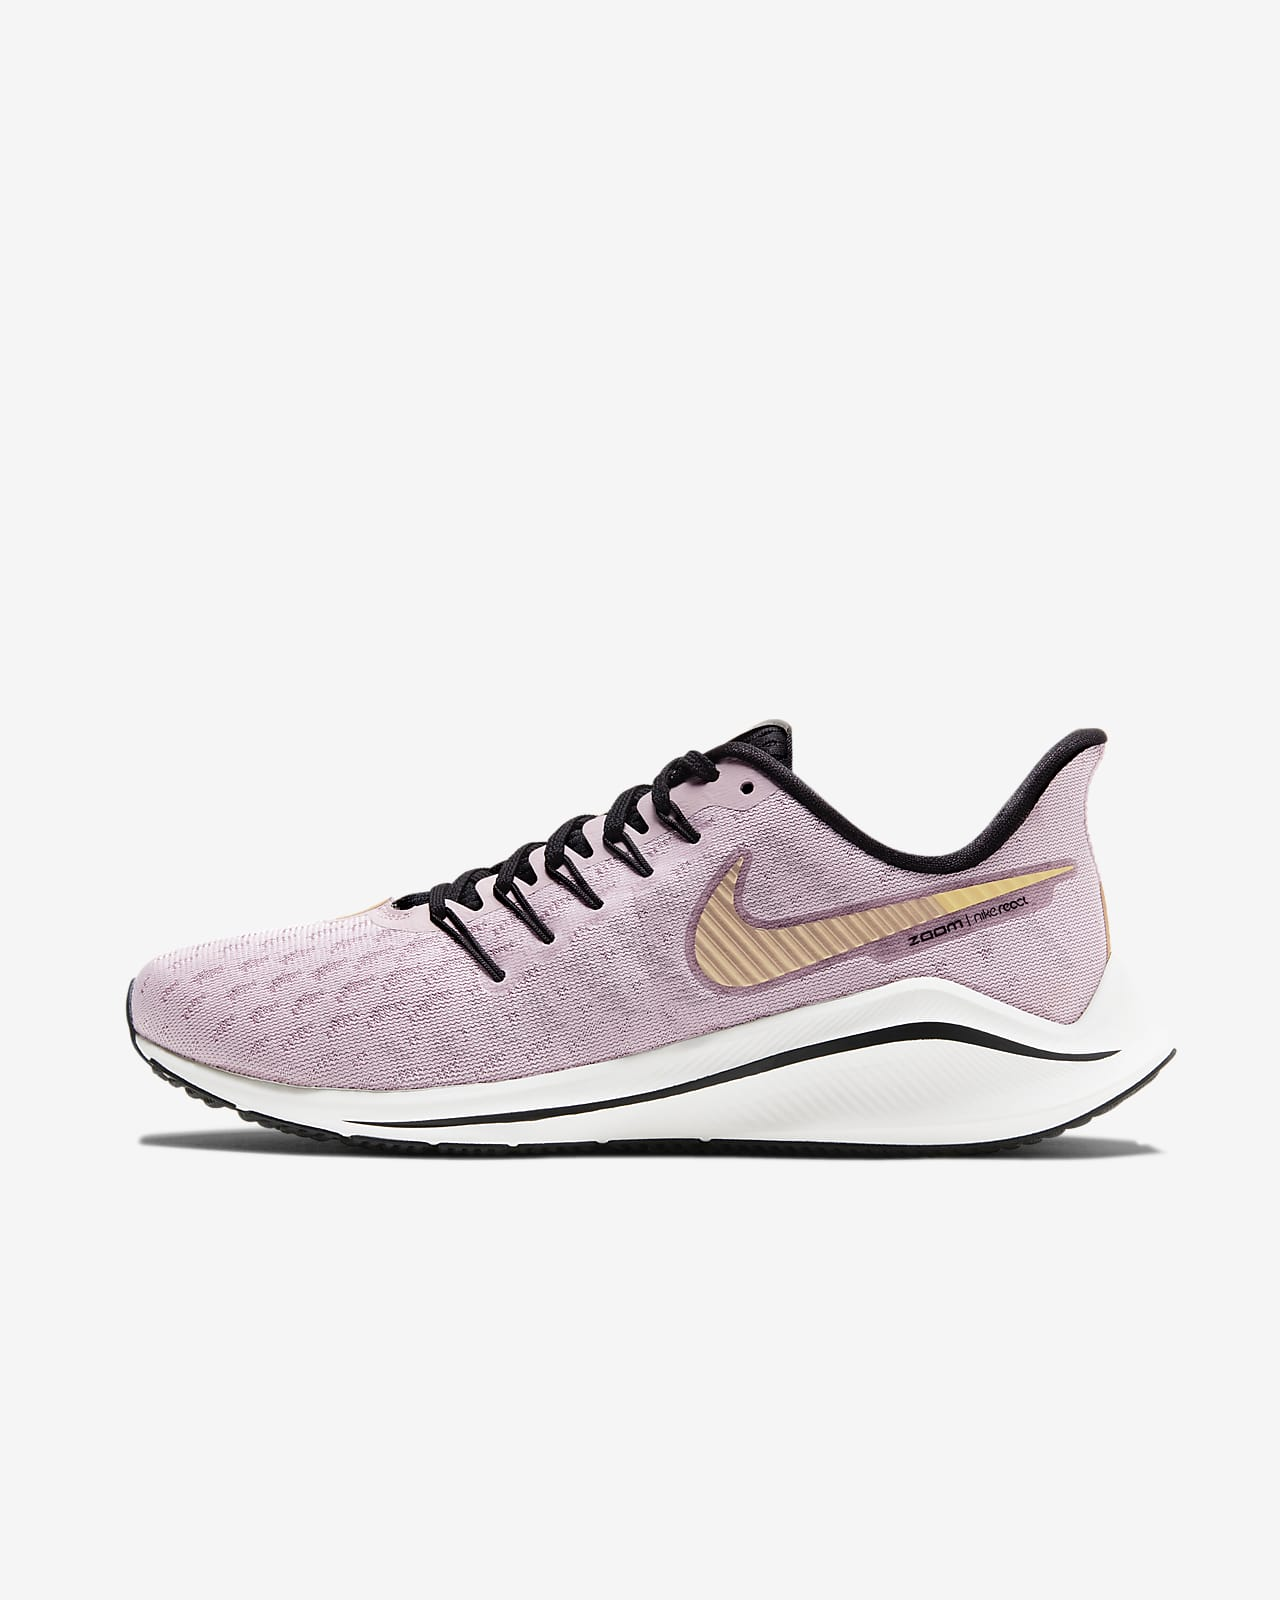 Posesión Janice Descuido  Nike Air Zoom Vomero 14 Women's Running Shoe. Nike LU